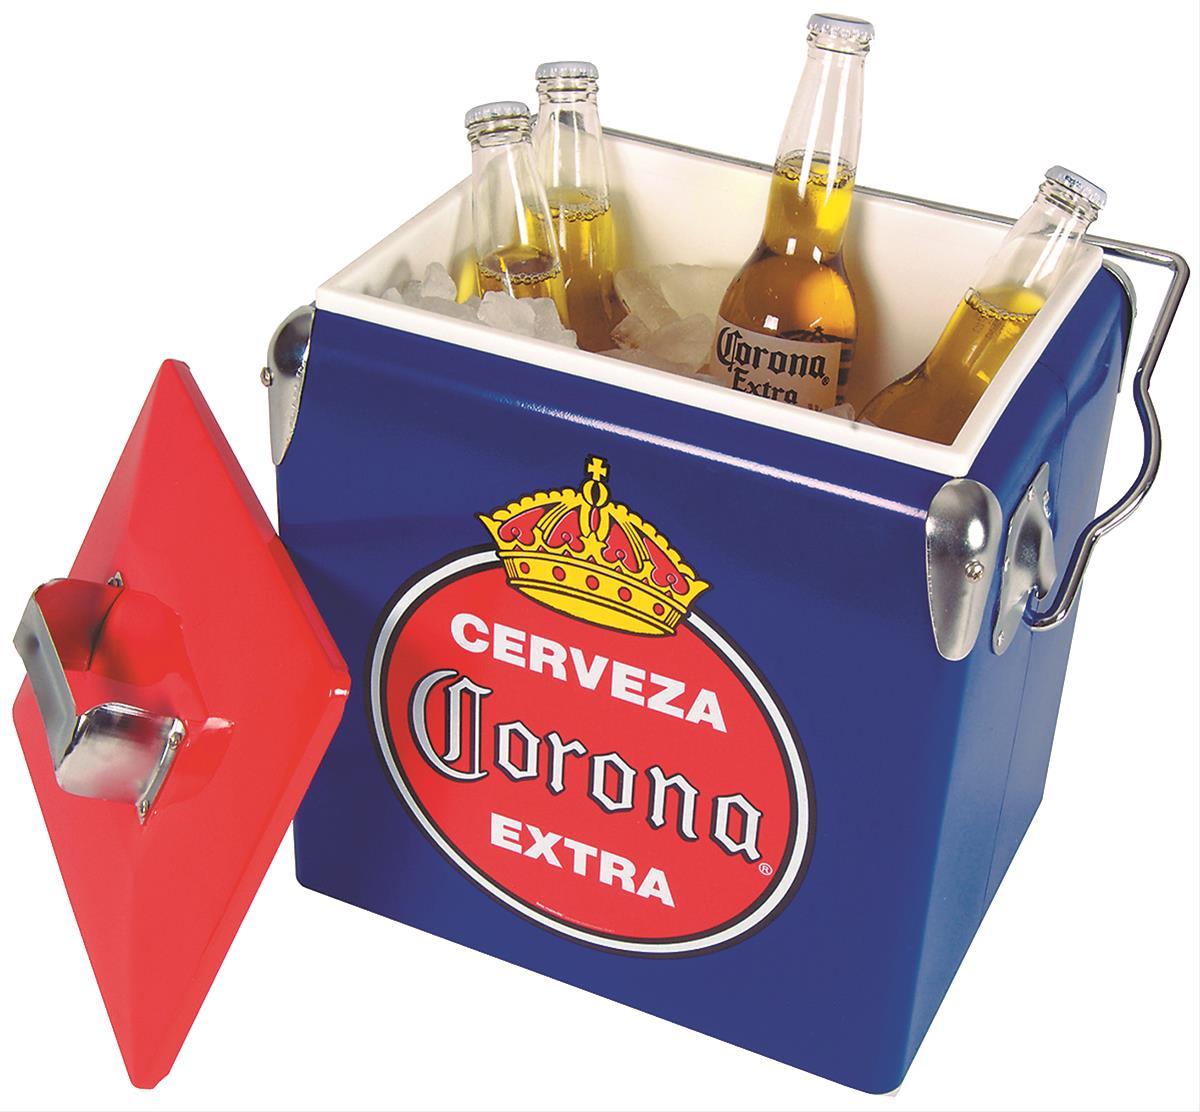 Vintage Corona Metal Cooler CORVIC-13